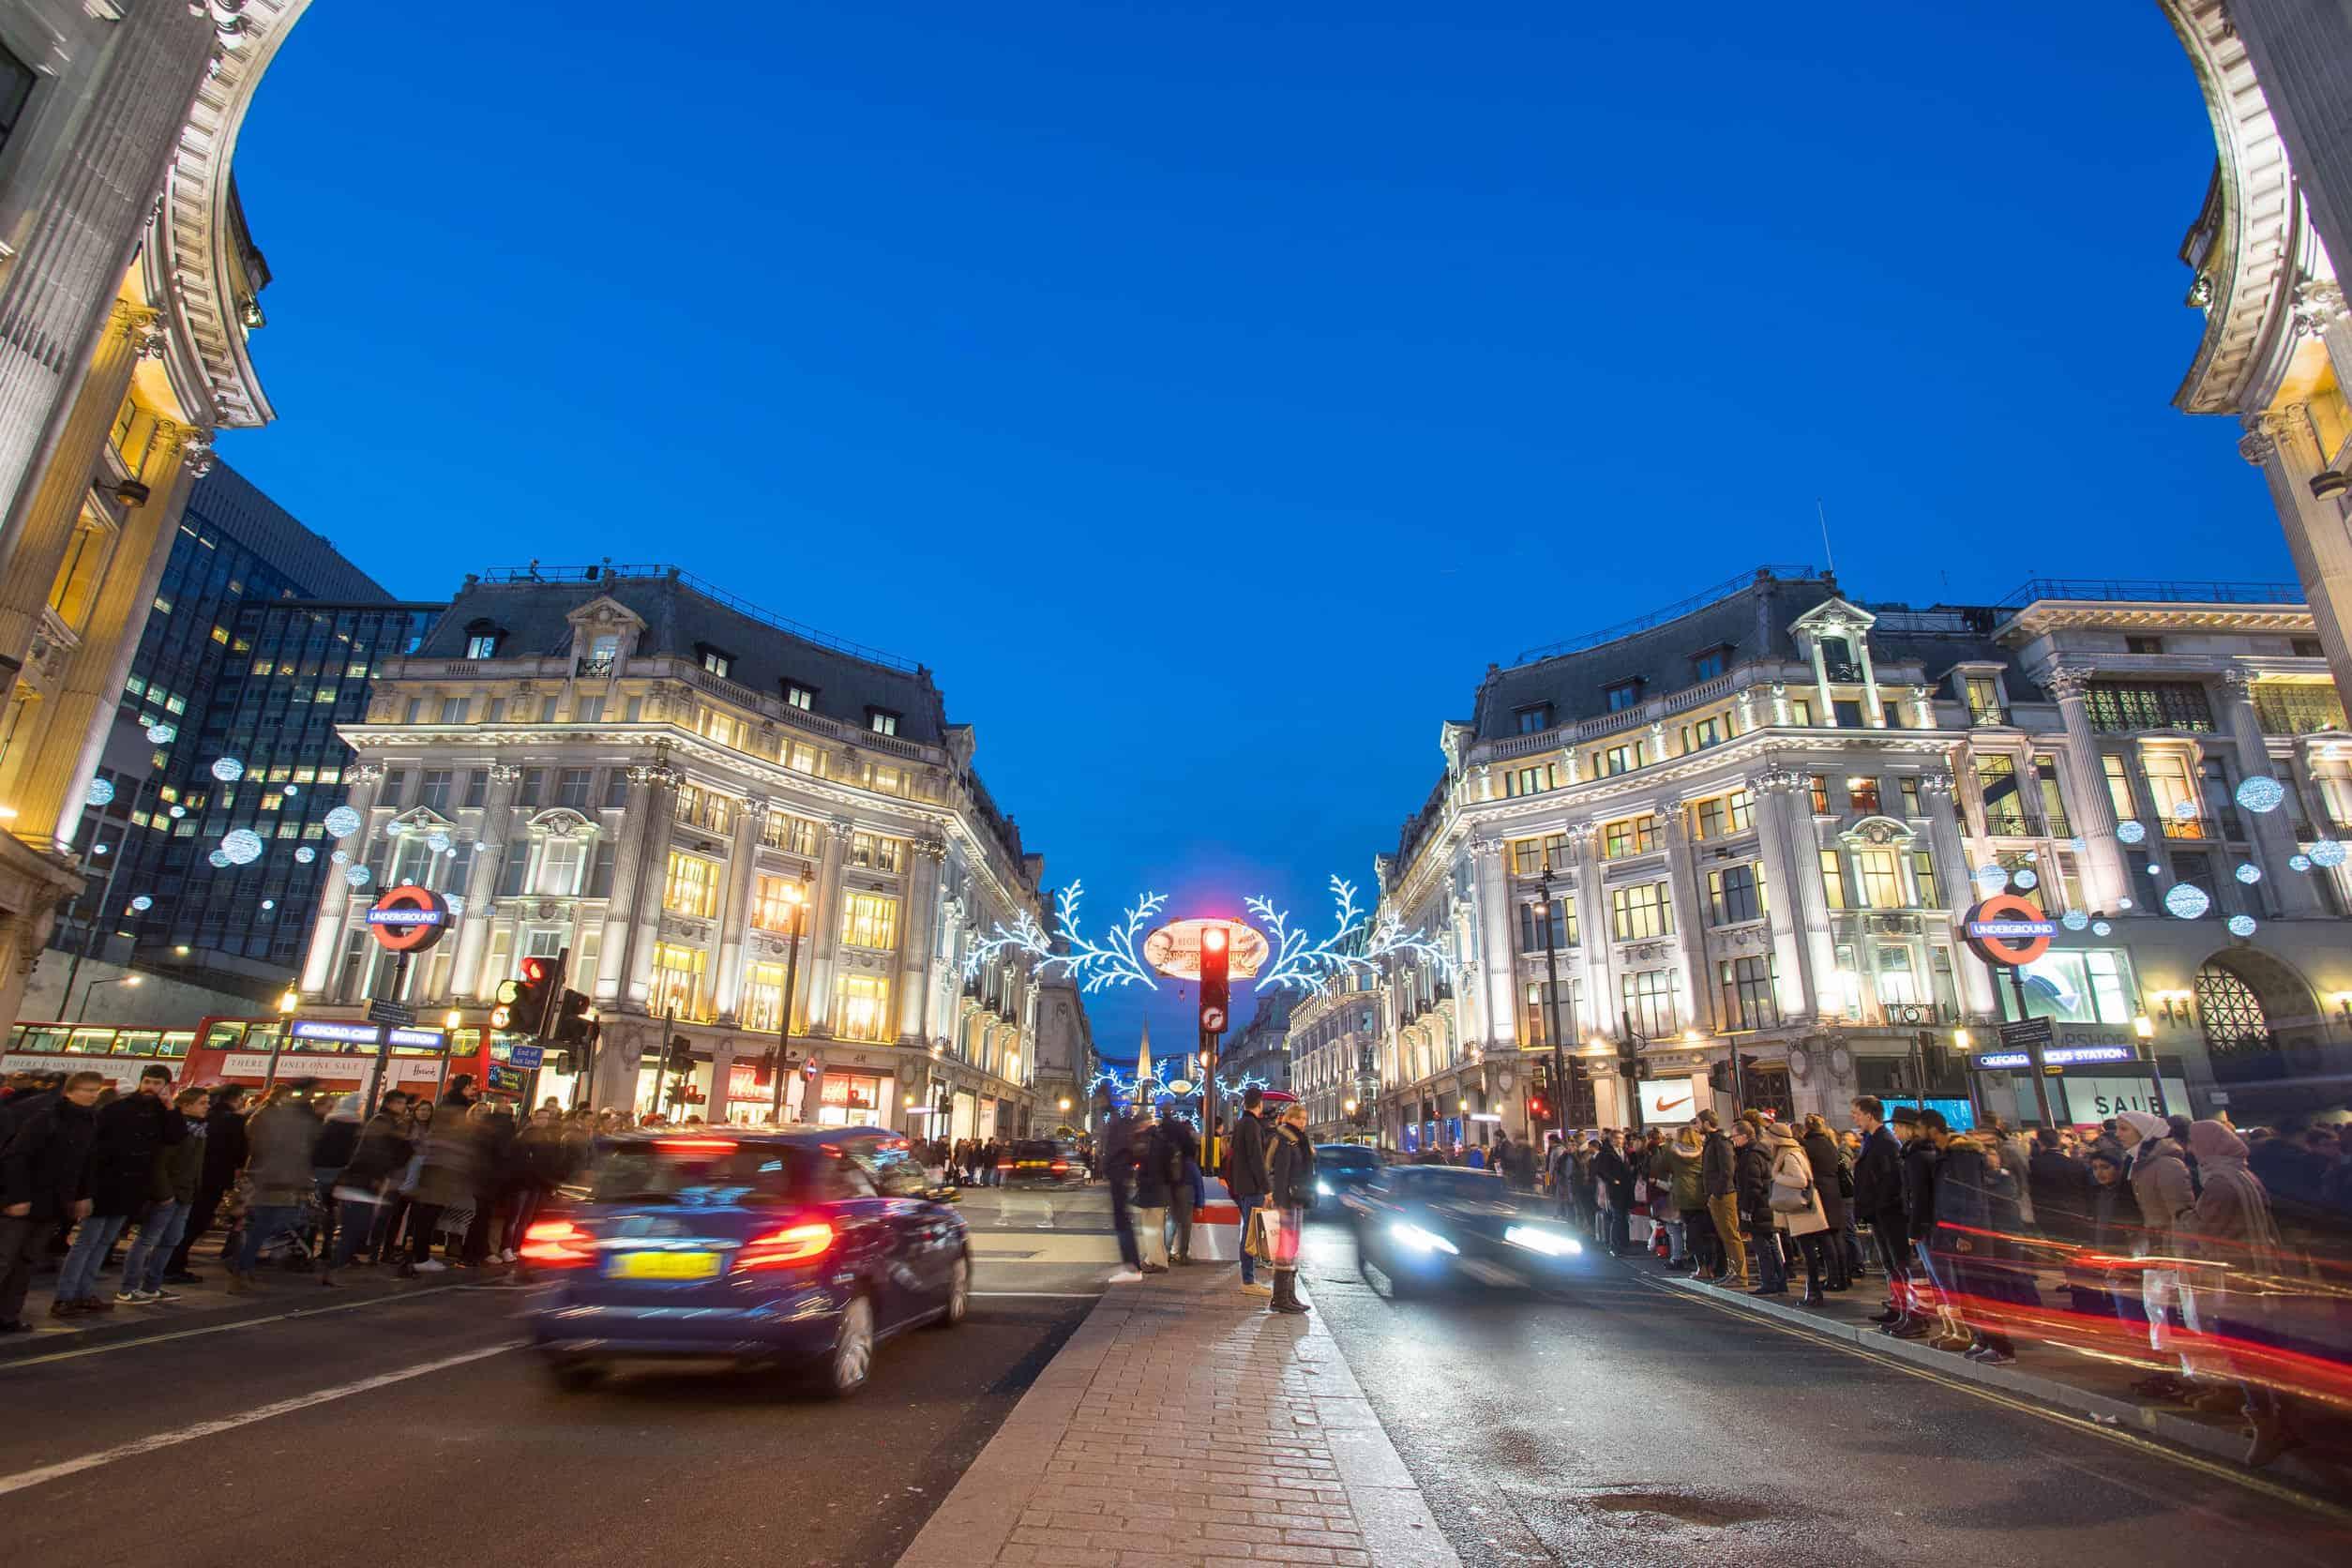 london, england, oxford street on sale season